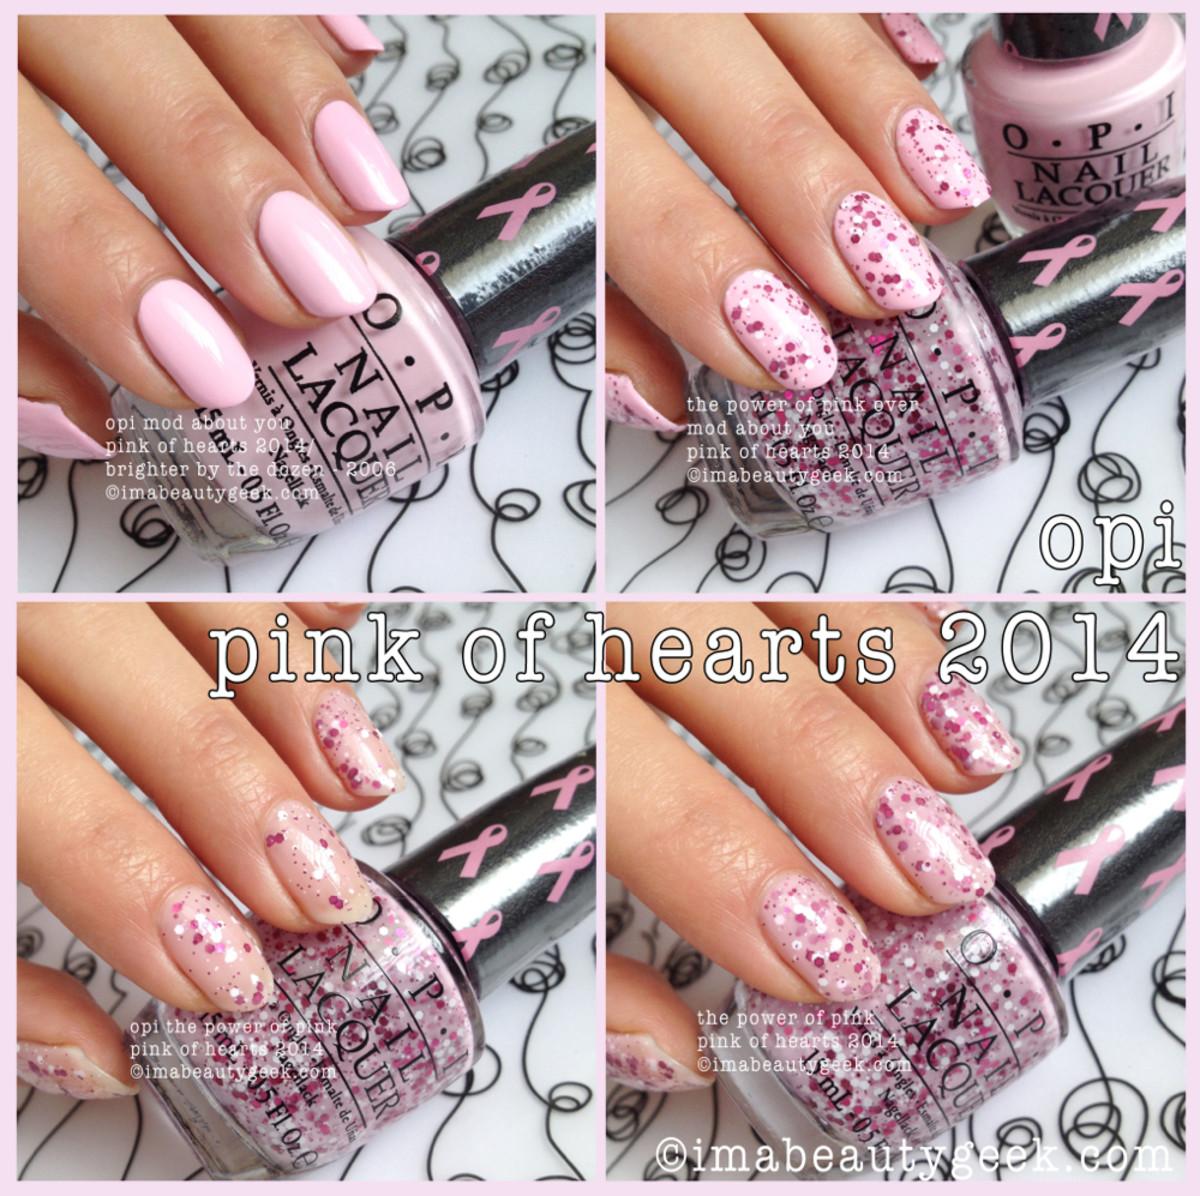 OPI Pink of Hearts 2014 BCA Beautygeeks